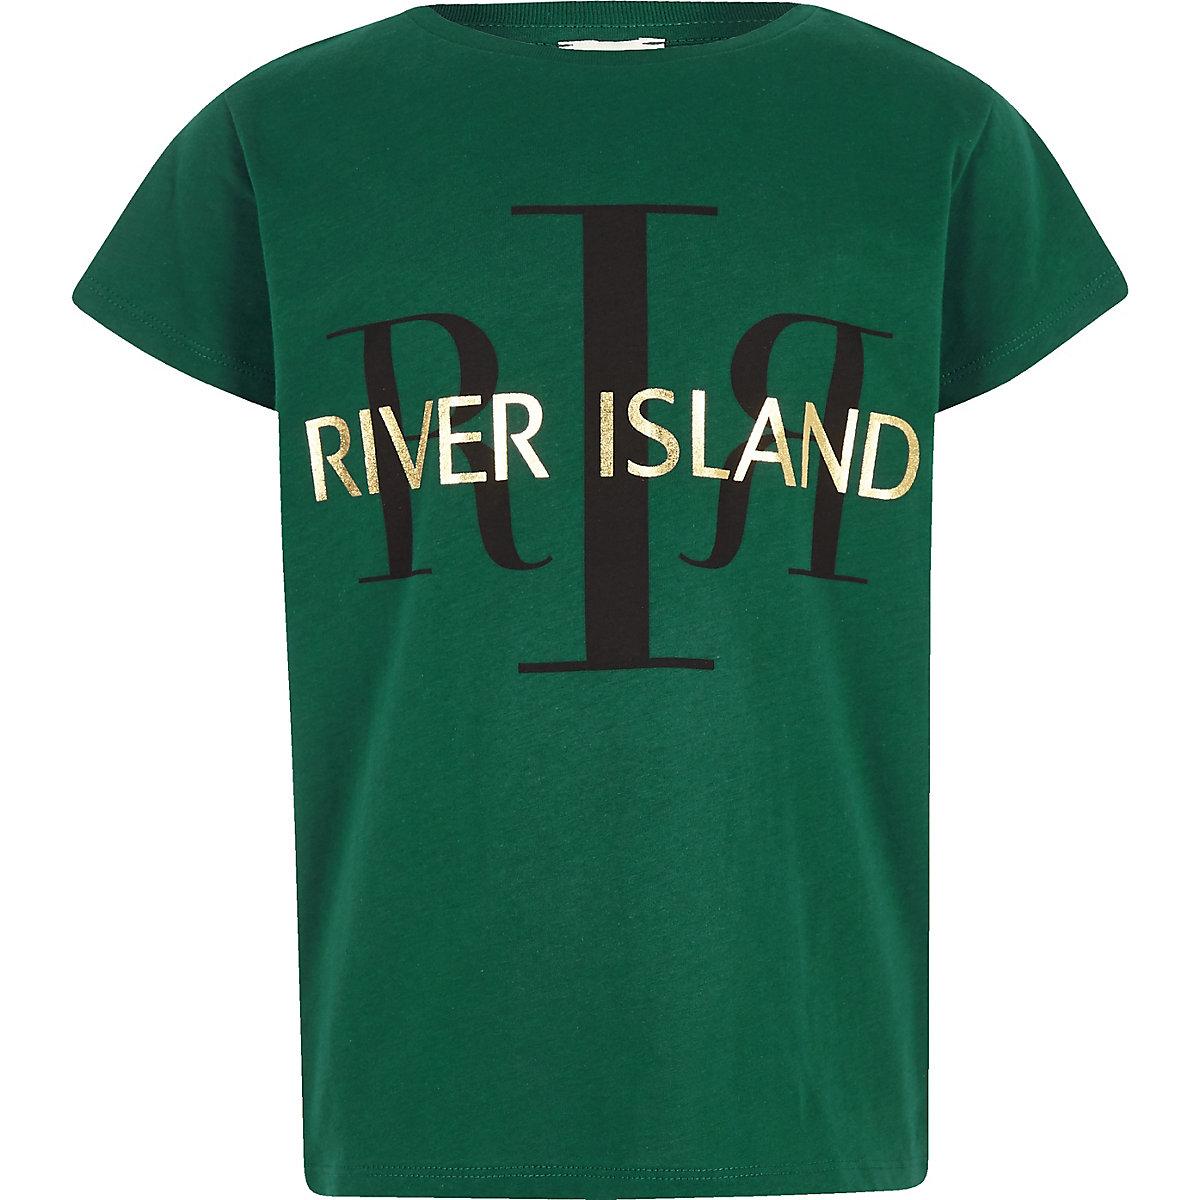 RI 30 girls green RI branded T-shirt